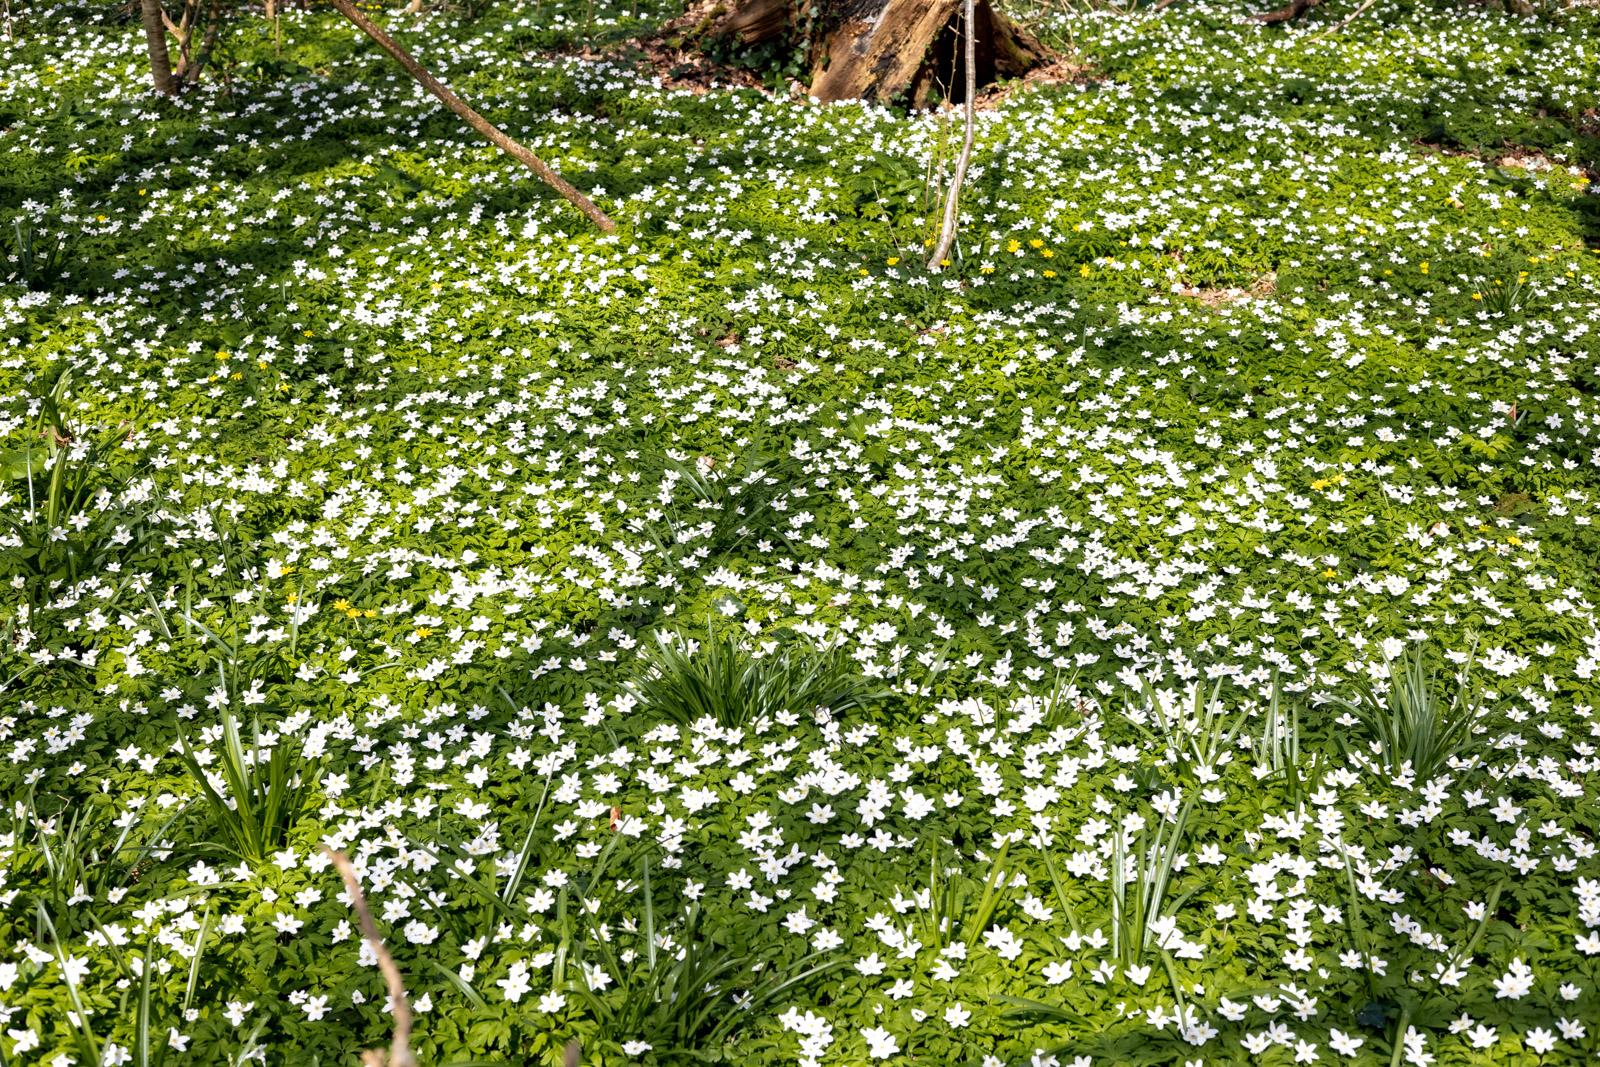 Wood Anemones - Park Wood, Wells, Somerset, UK. ID K2A0680